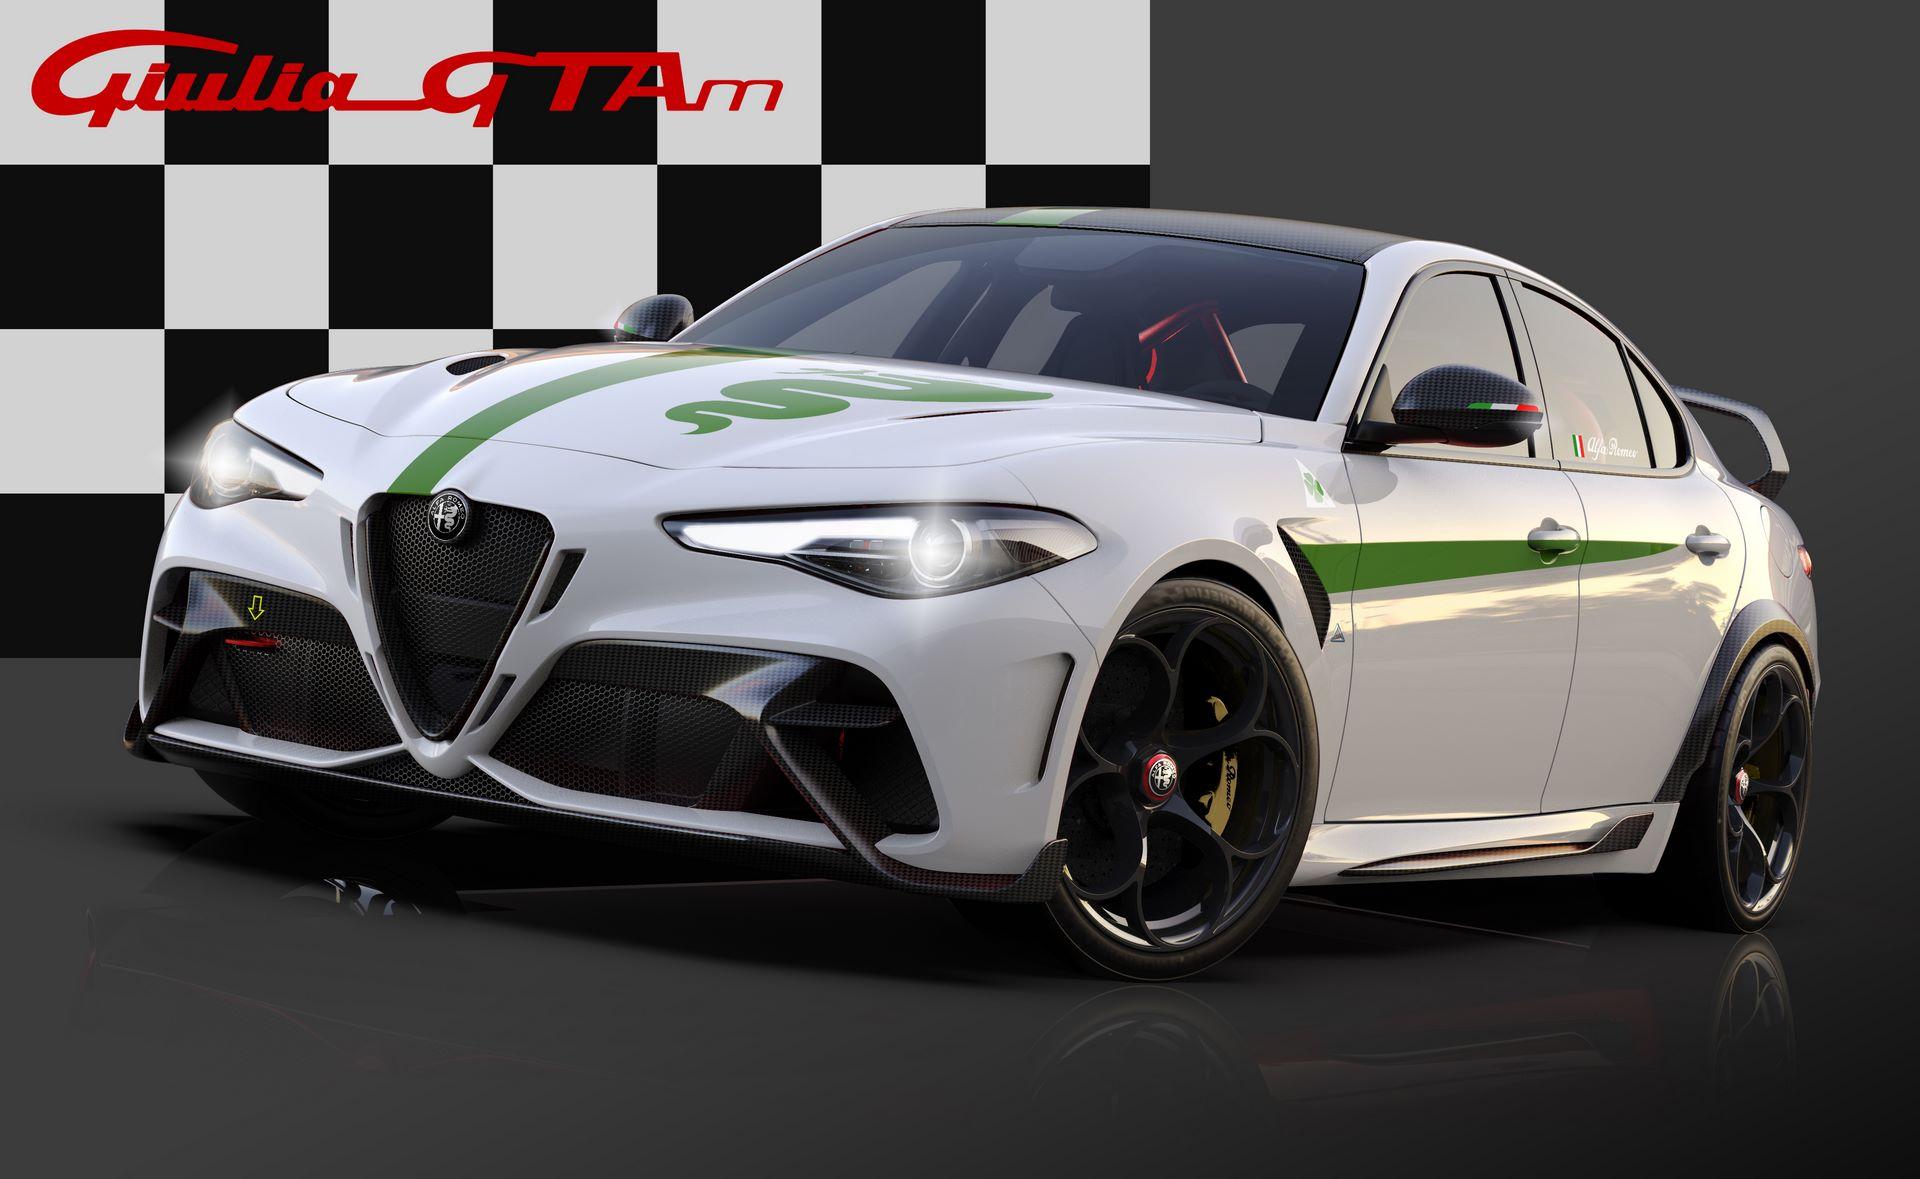 26_Alfa-Romeo-Giulia-GTA-dedicated-Livery